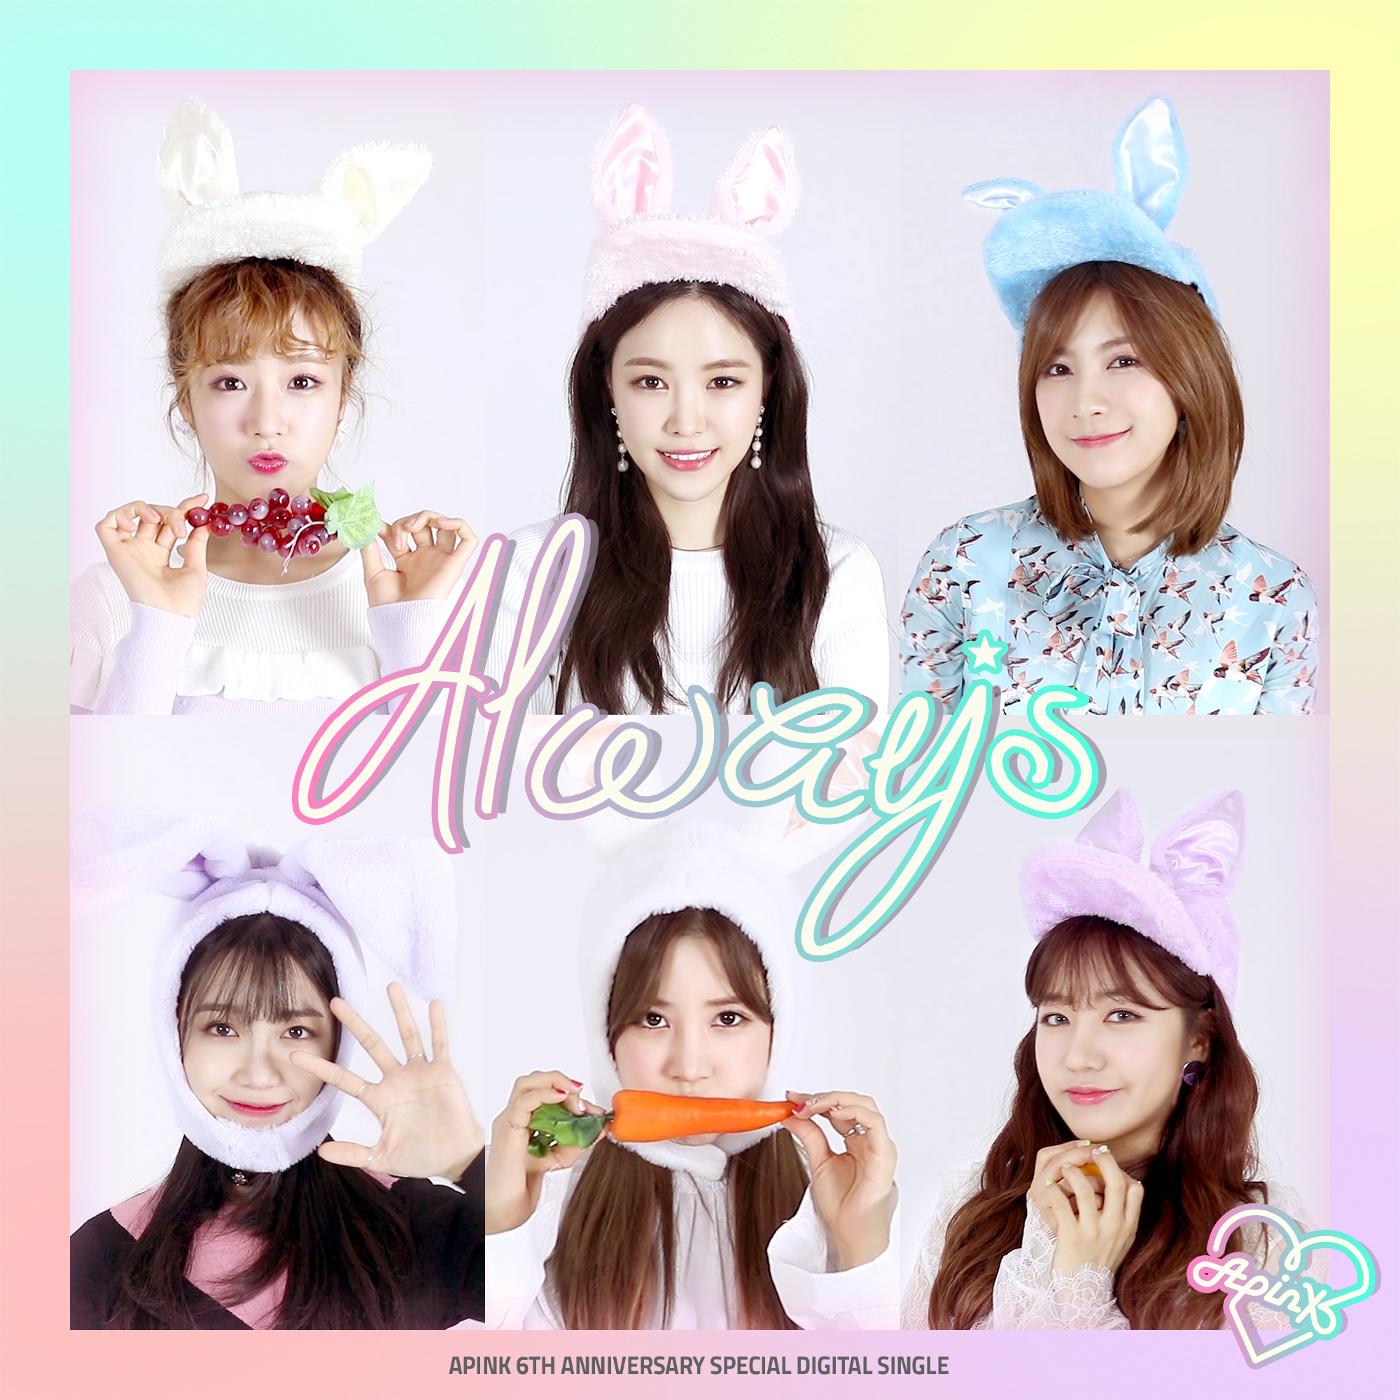 Always (Apink)